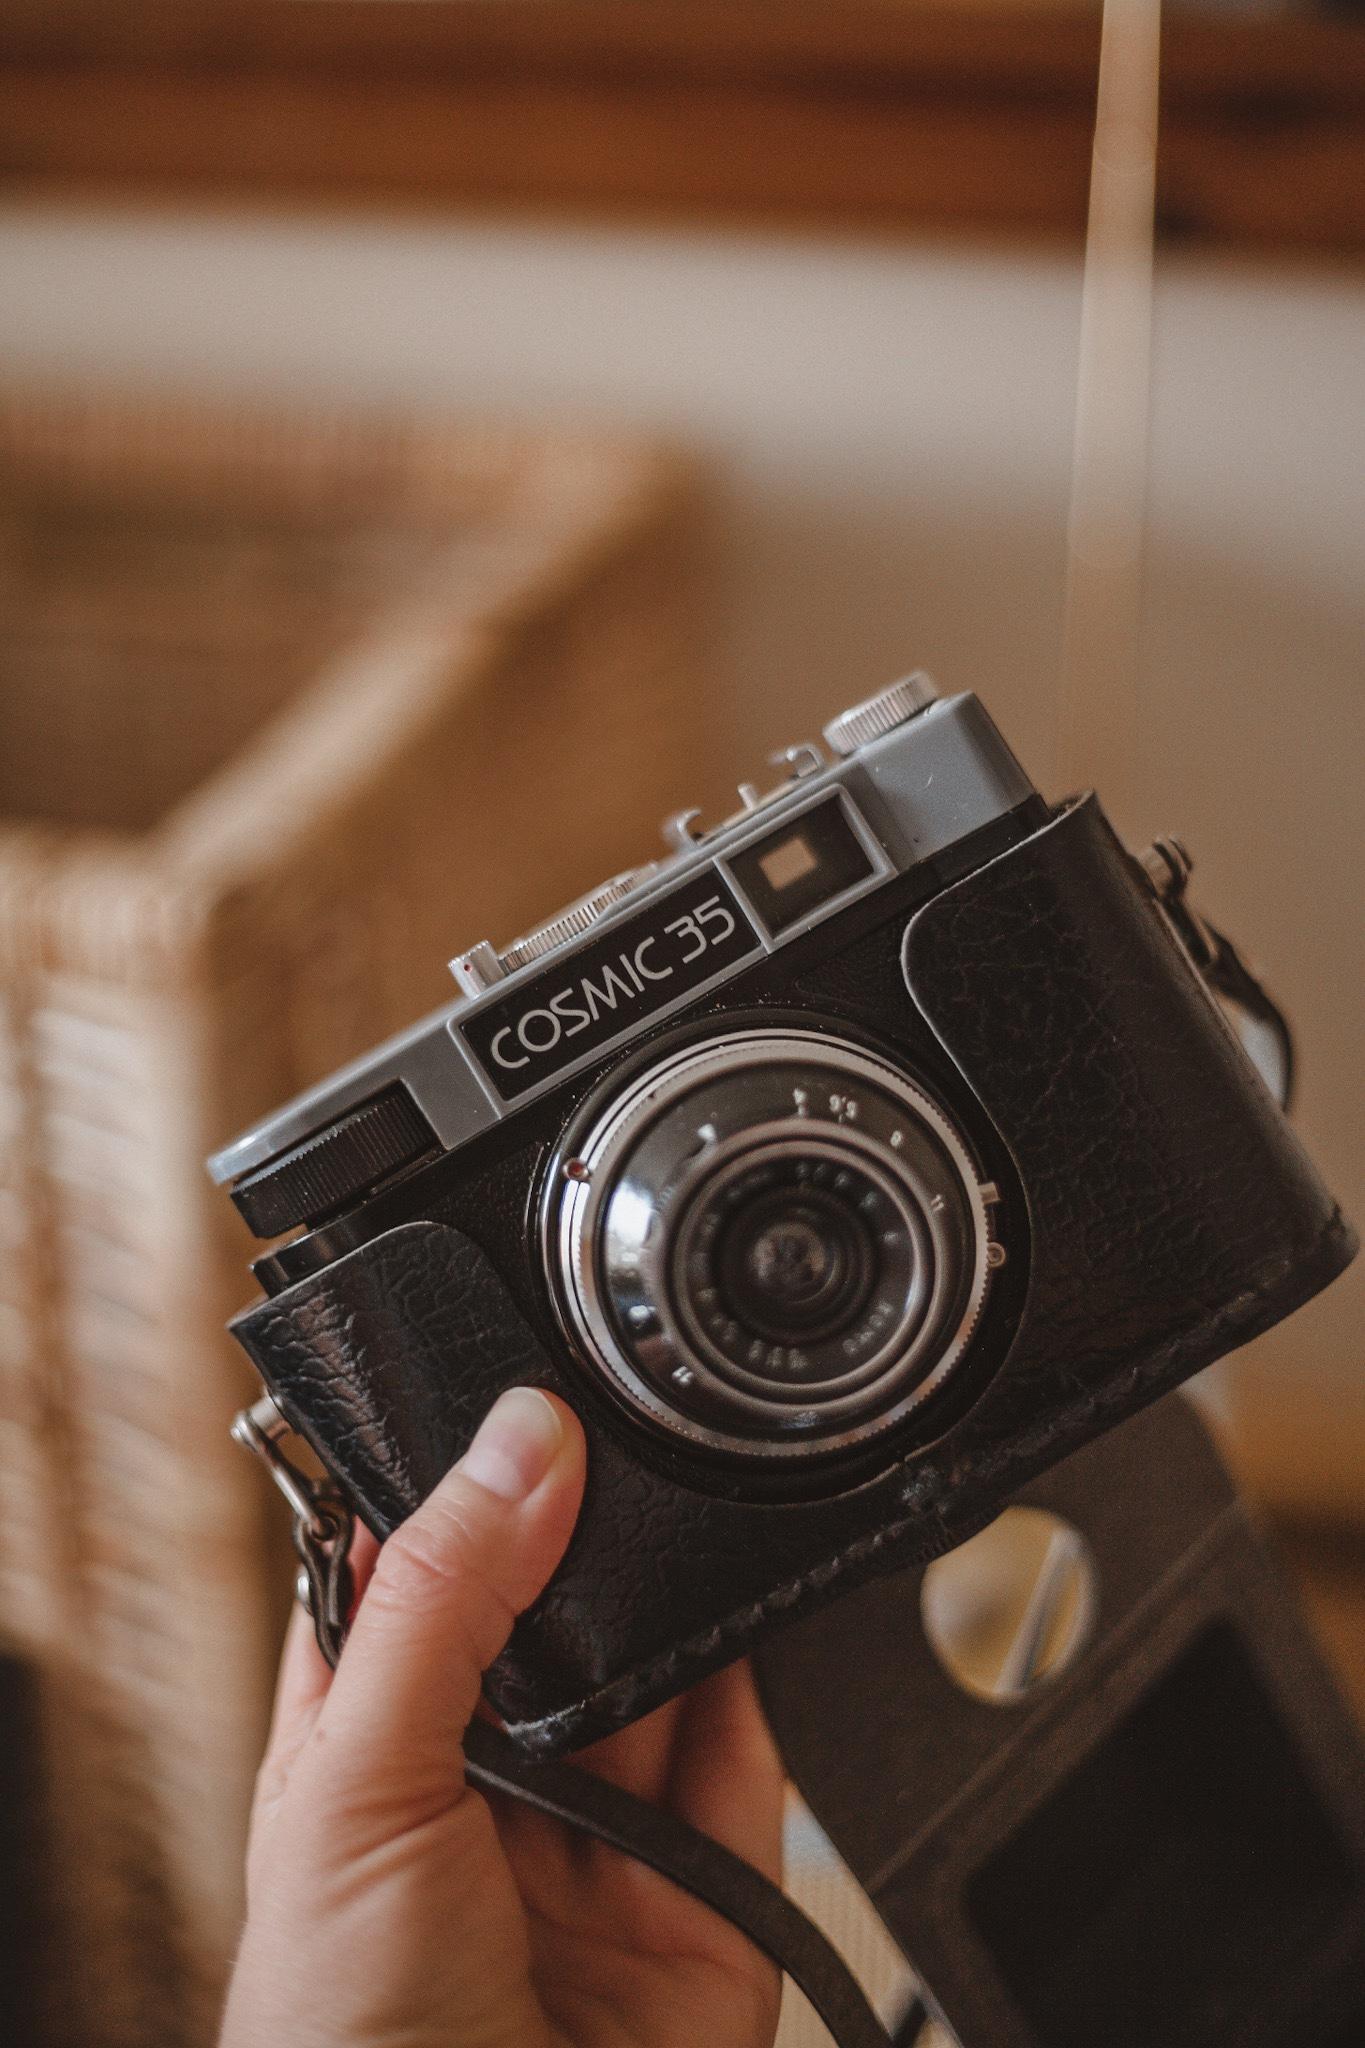 Cosmic 35 Film Camera, Smena-8, Smena 8, Cosmic 35, Soviet Film Camera, Katie Writes,